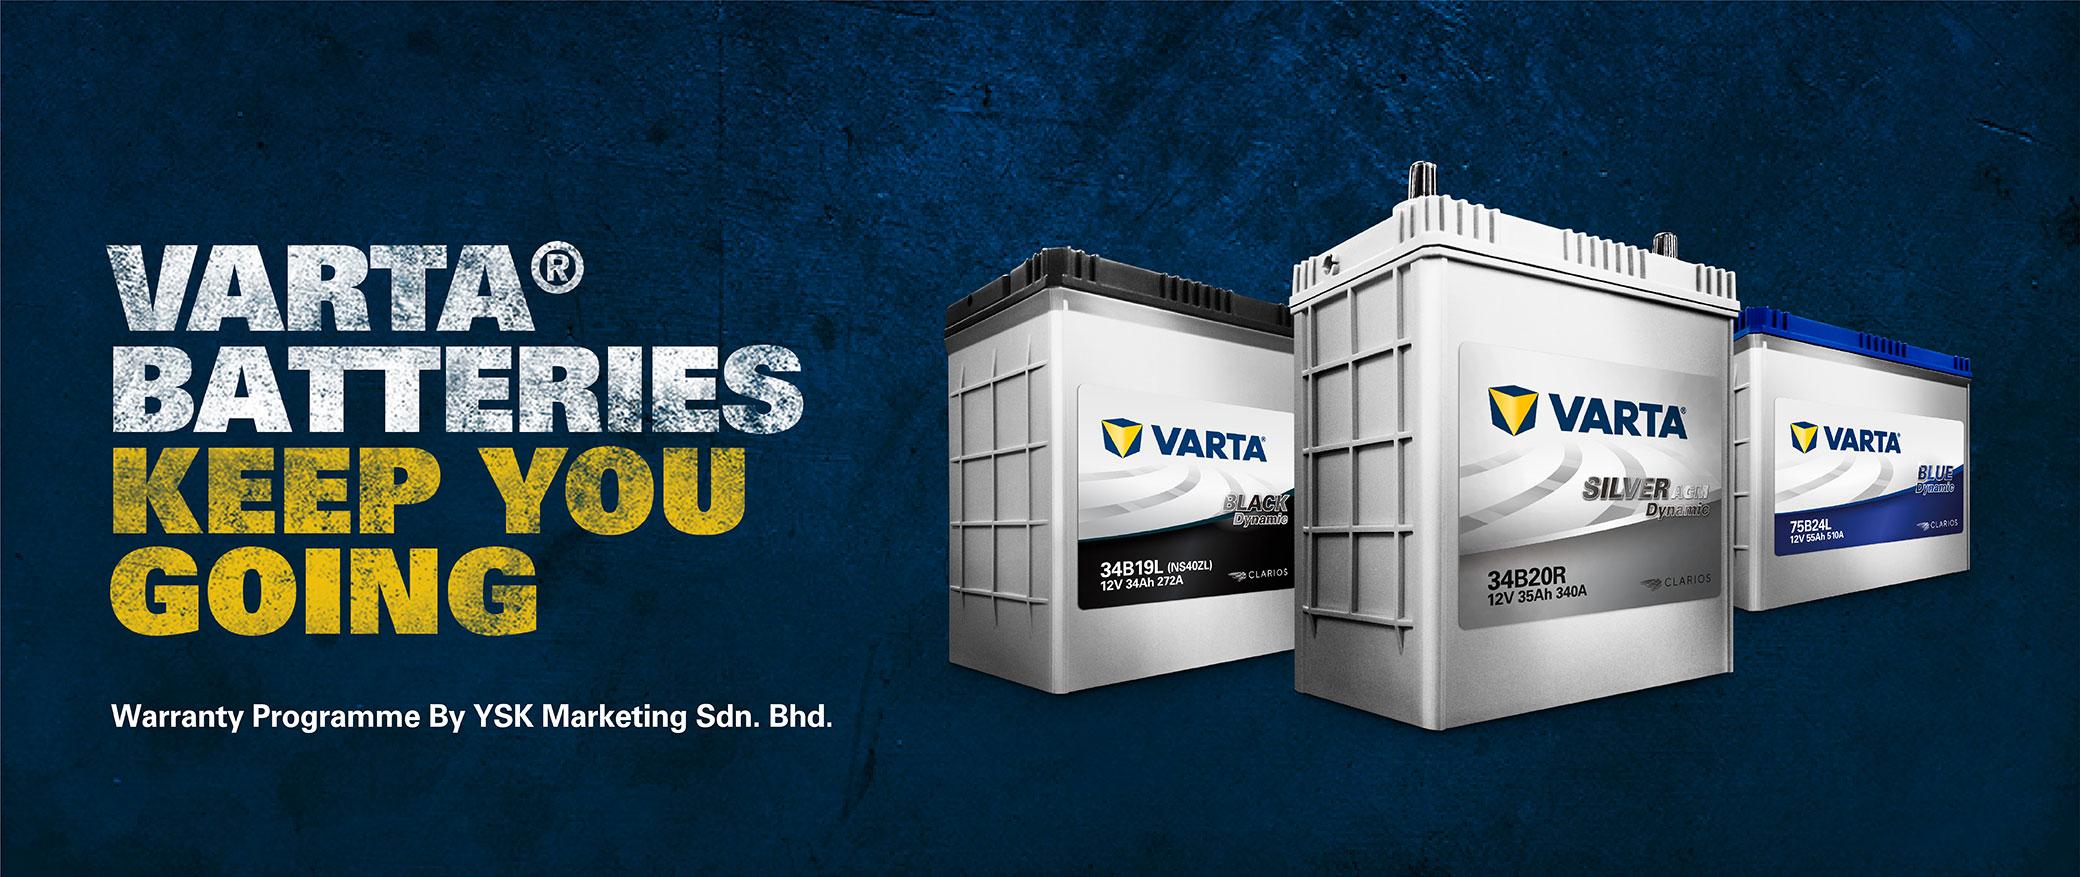 Varta Batteries keeps you going - warranty program